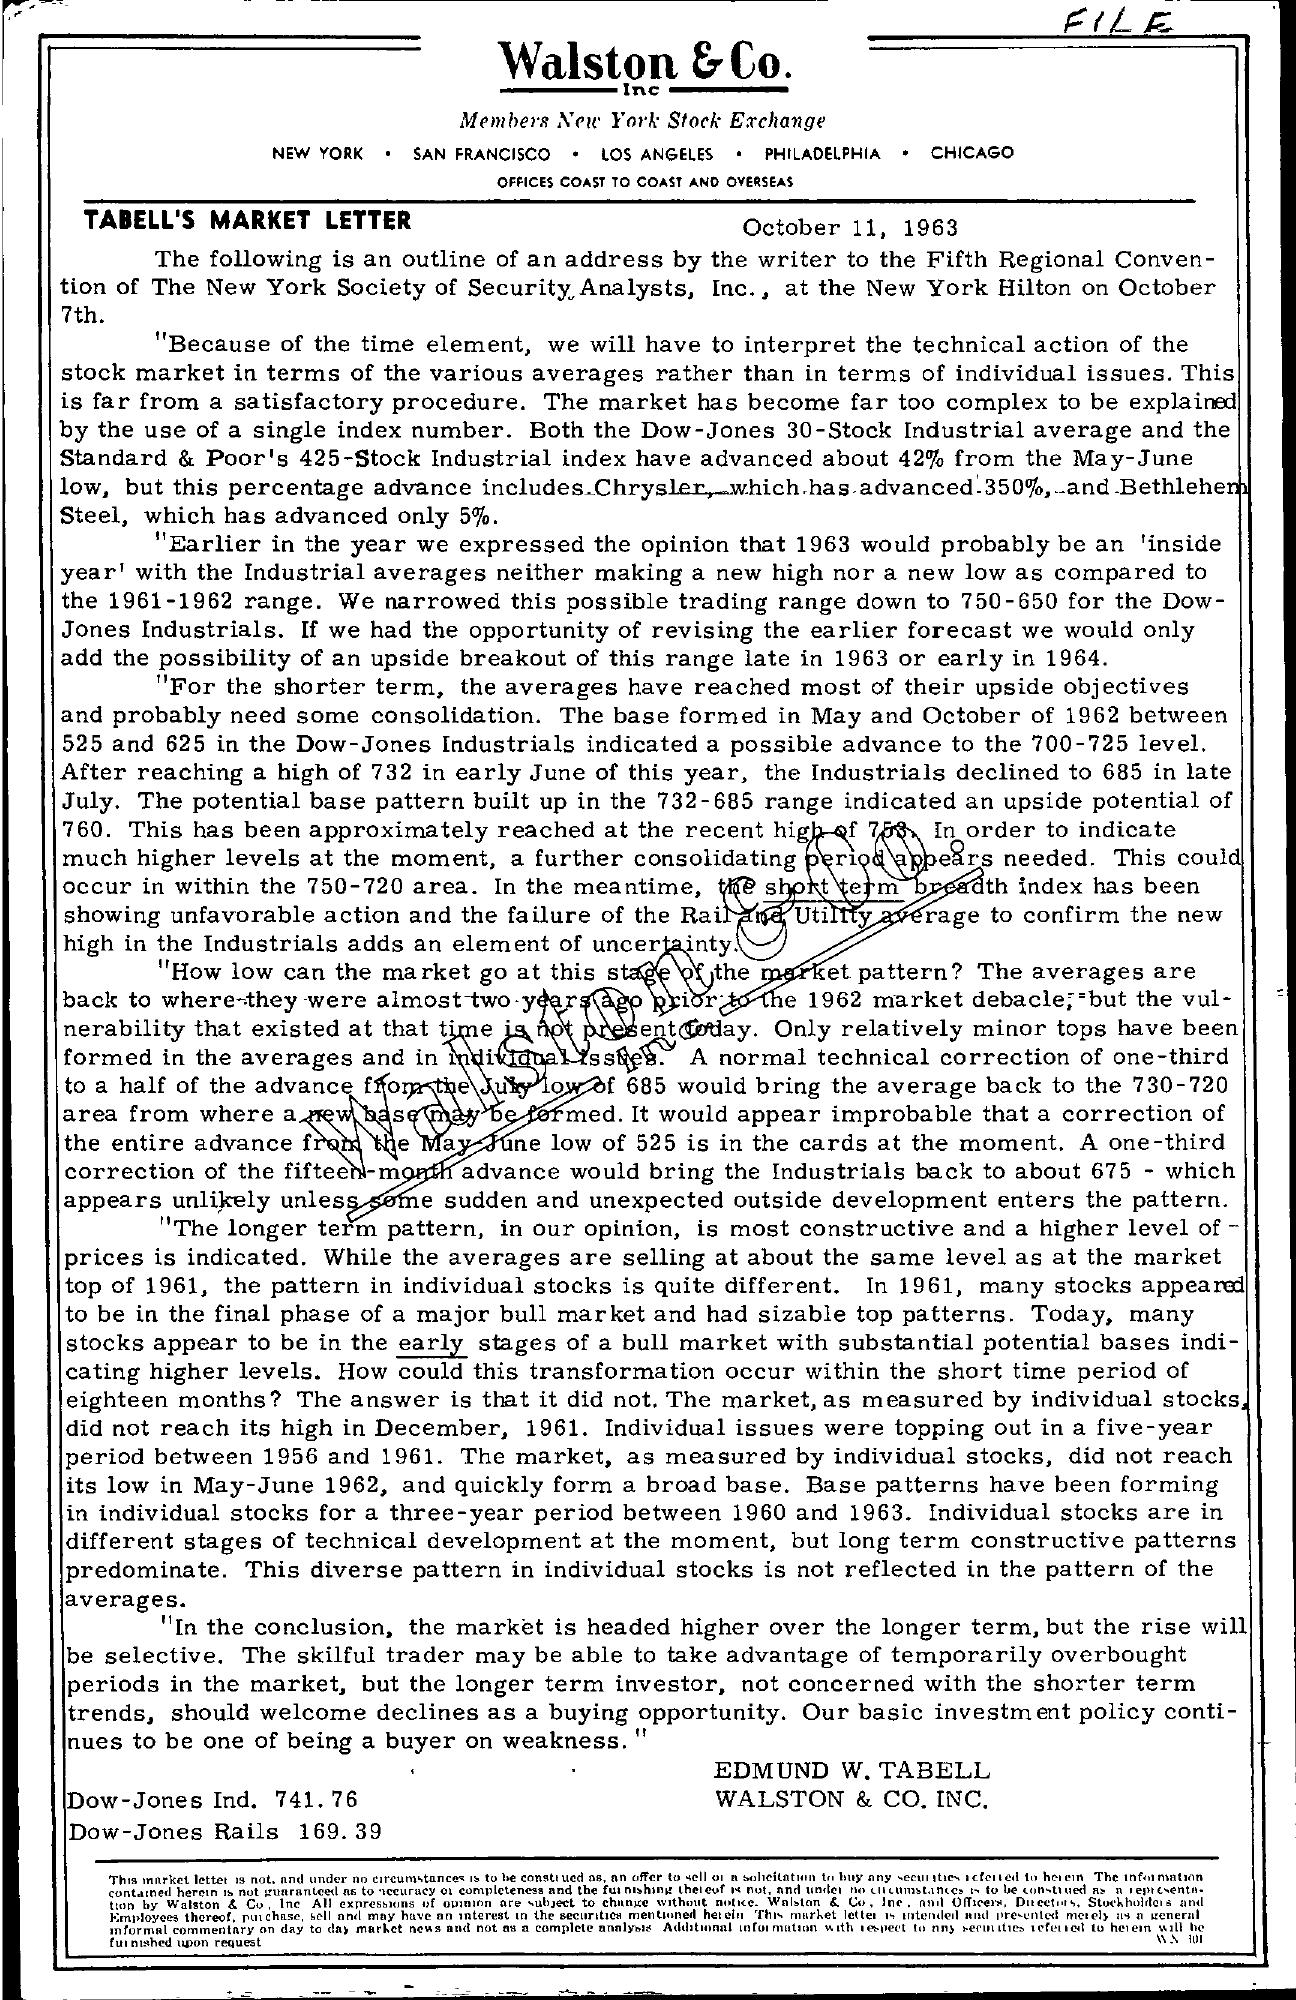 Tabell's Market Letter - October 11, 1963